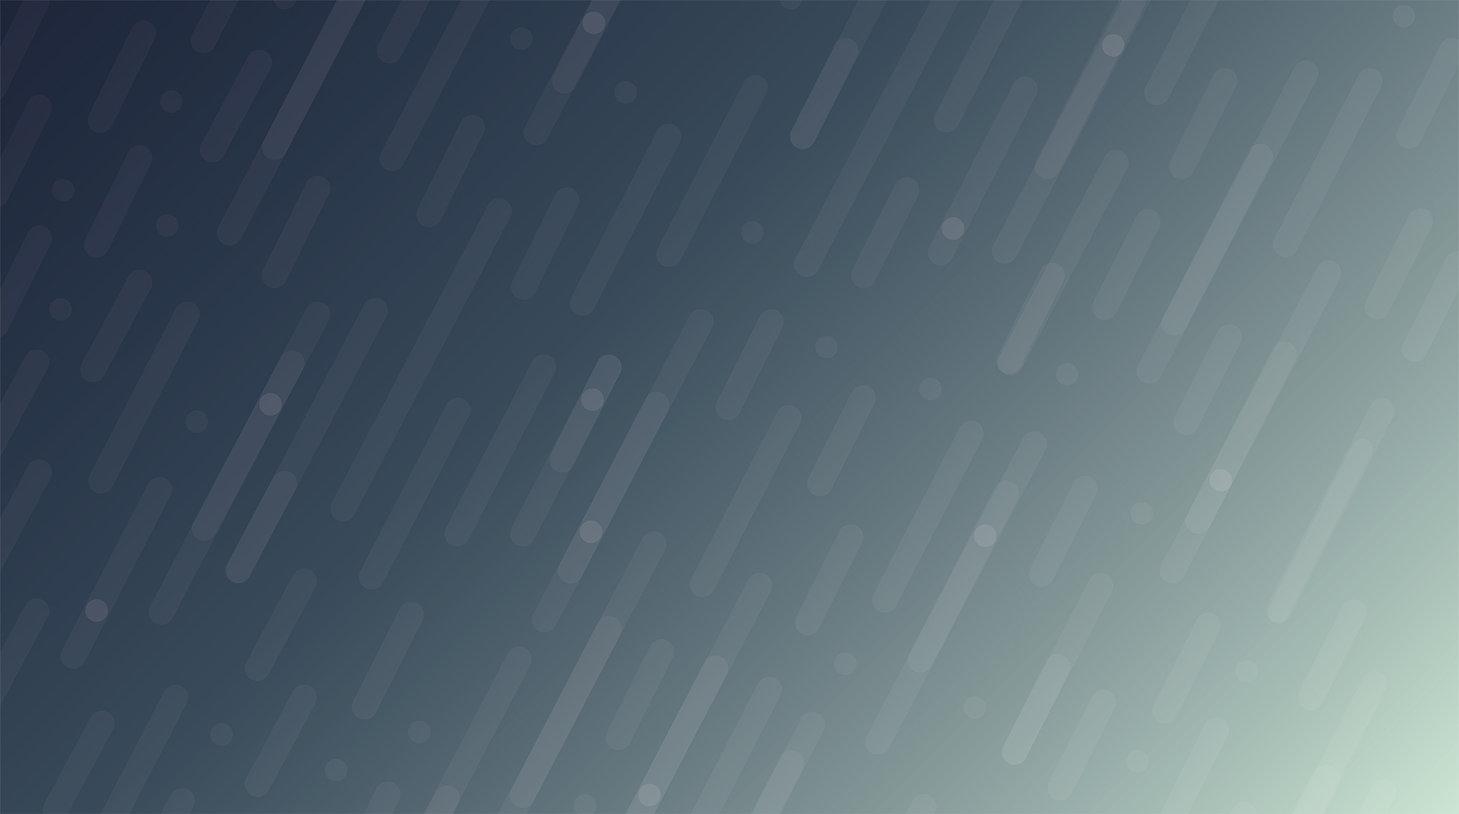 bg+pattern.jpg